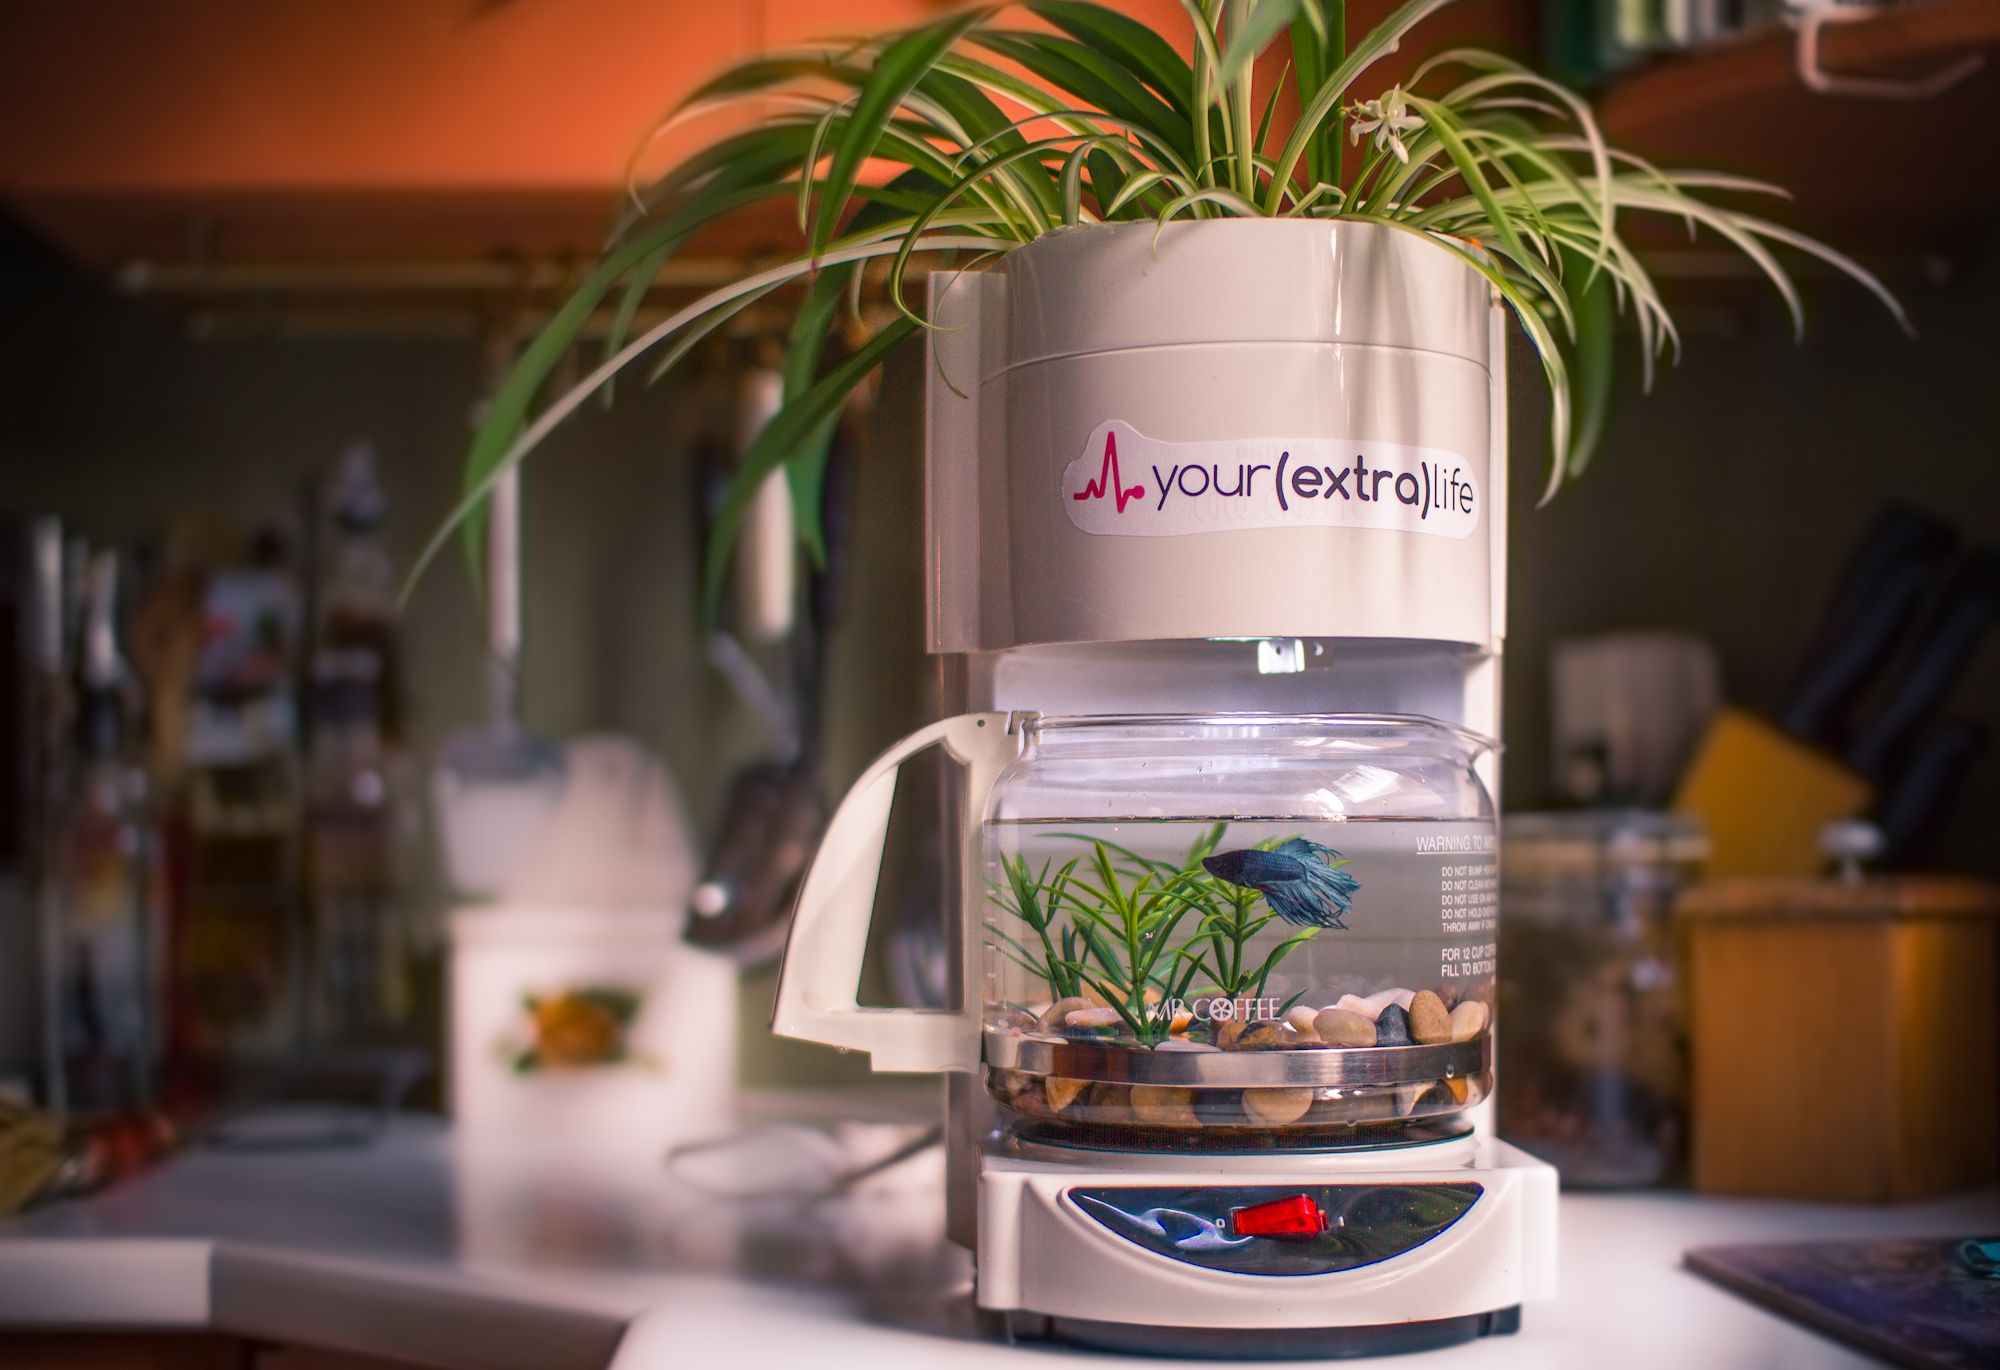 Repurposing old coffee machine repurposed has beta fish tank